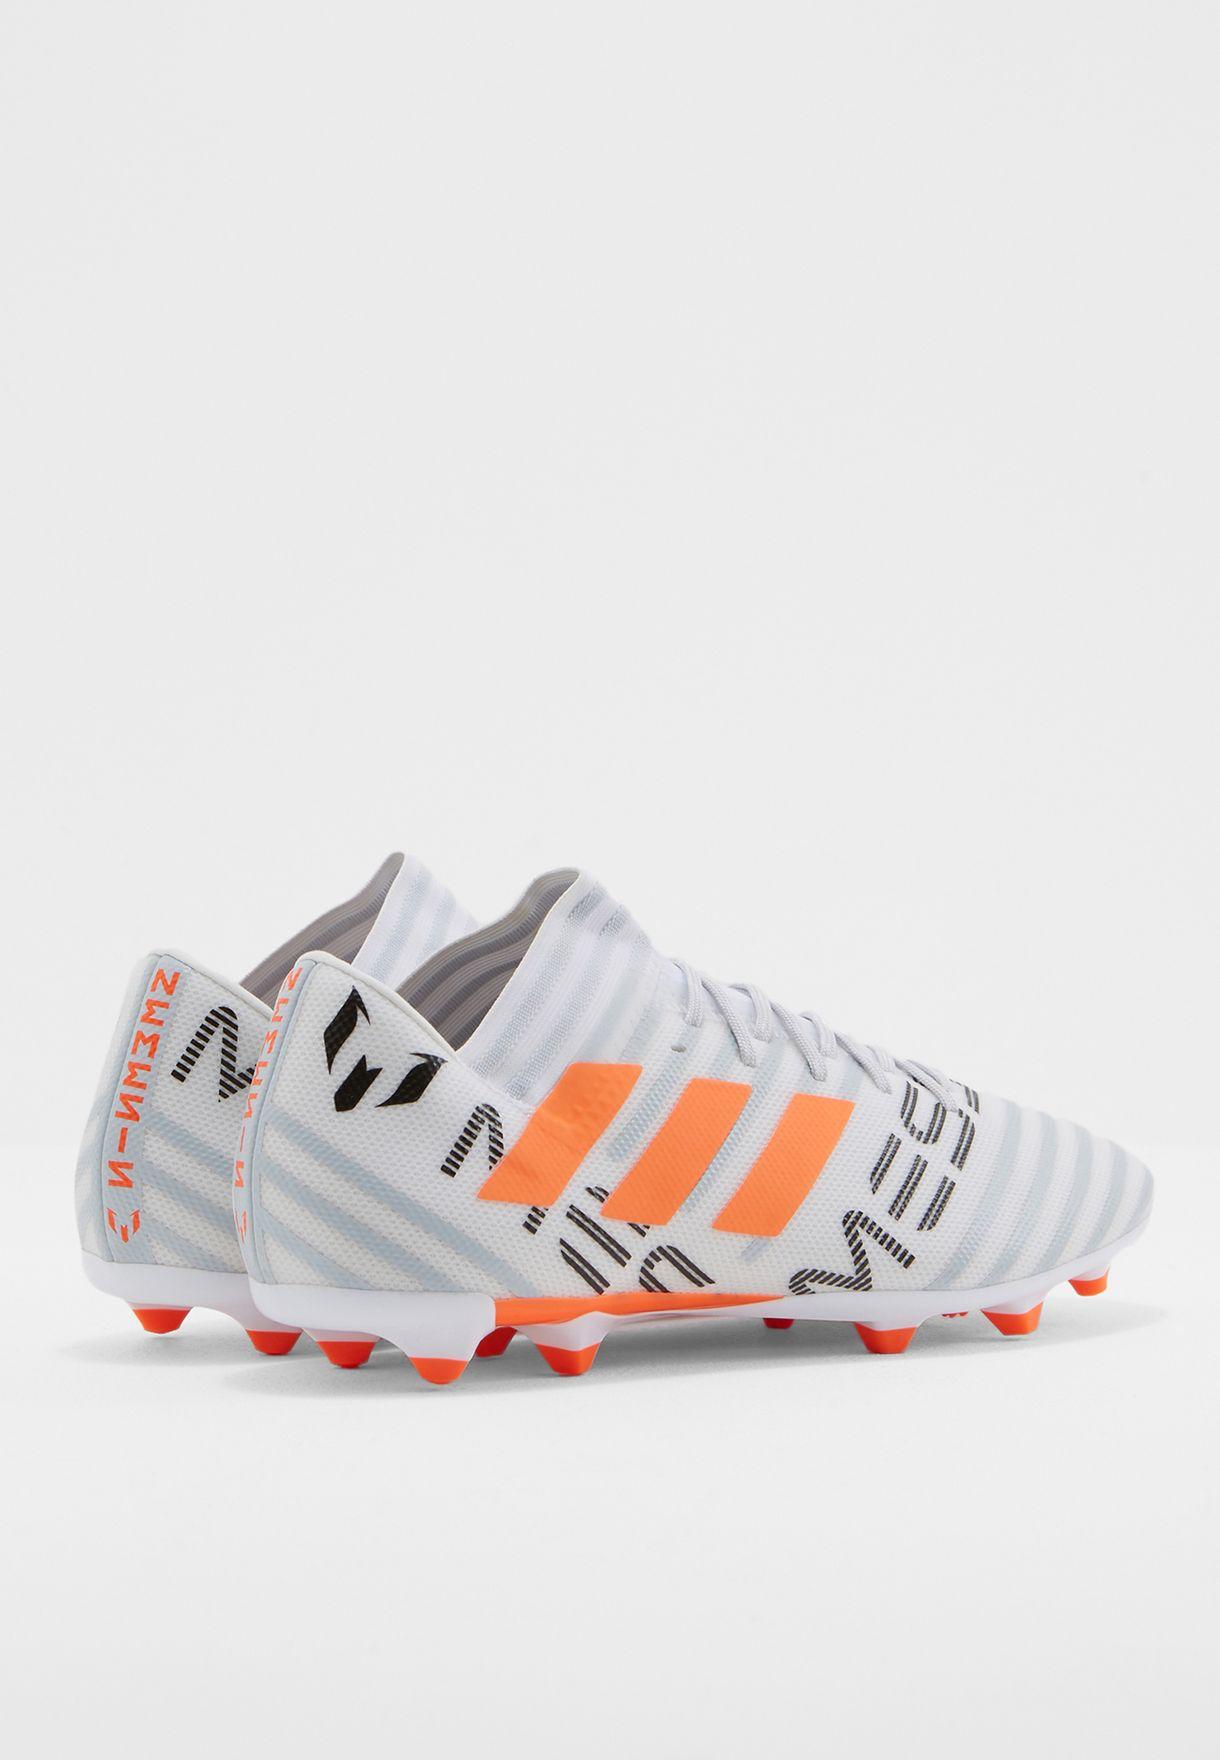 c425a7f7e74 Shop adidas prints Nemeziz Messi 17.3 FG CG2965 for Men in UAE ...